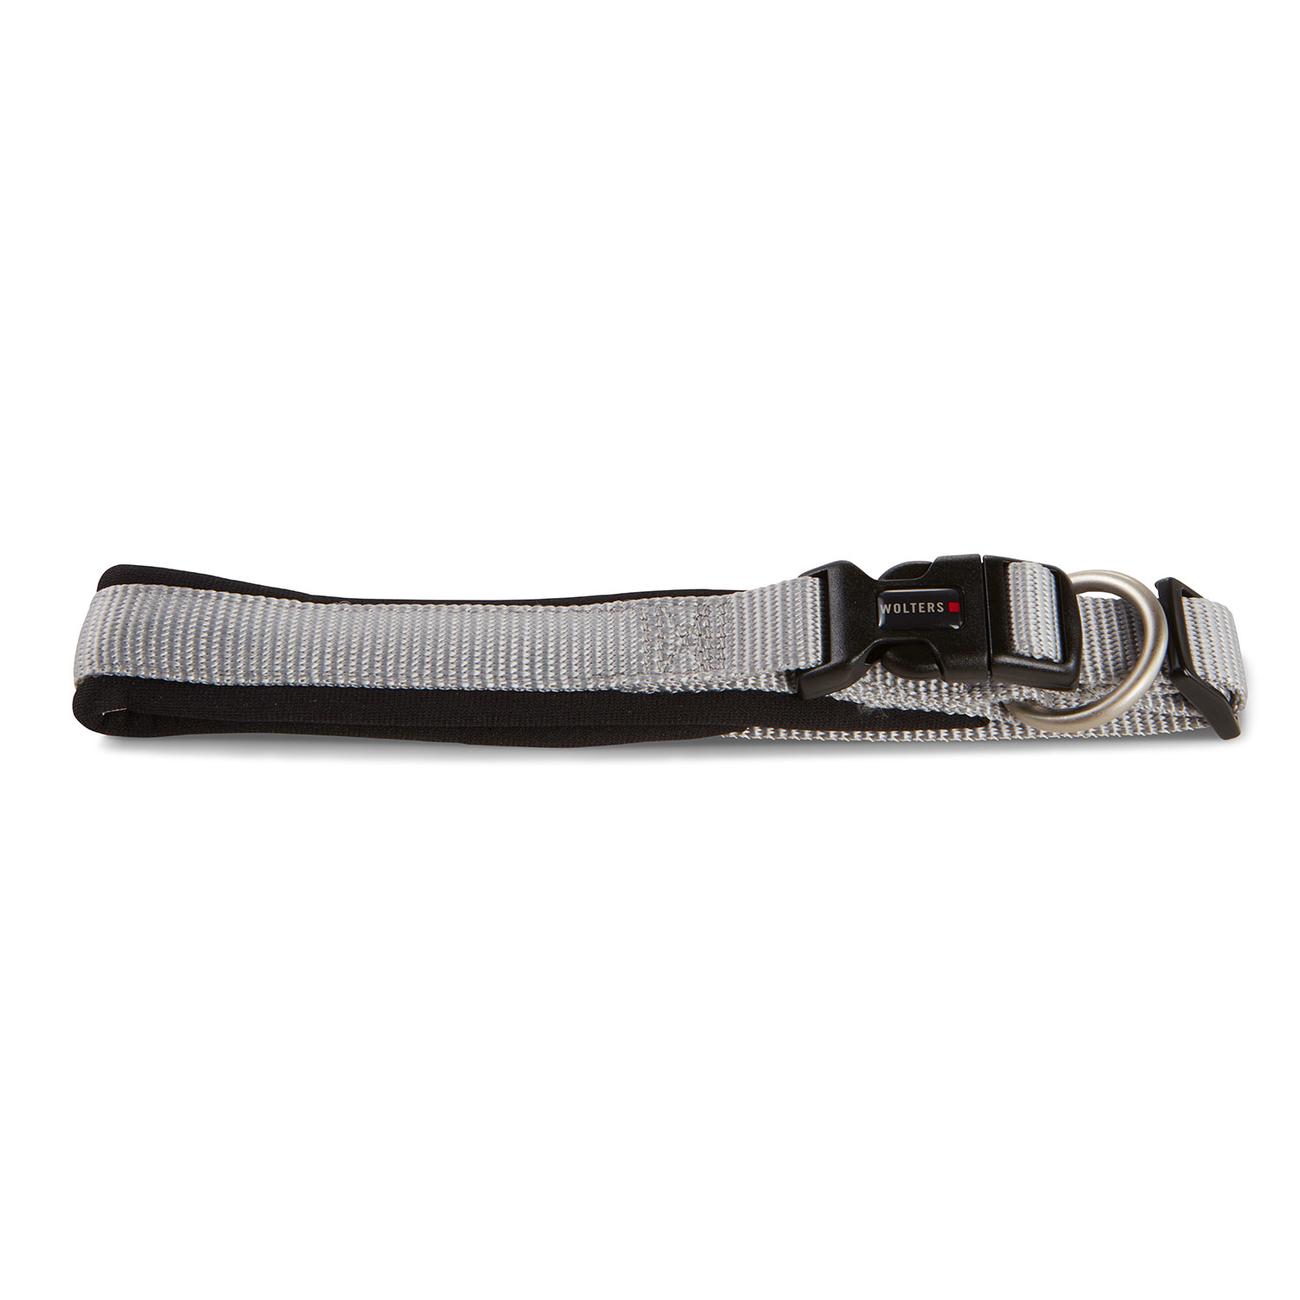 Wolters Halsband Professional Comfort Extra breit, Bild 6